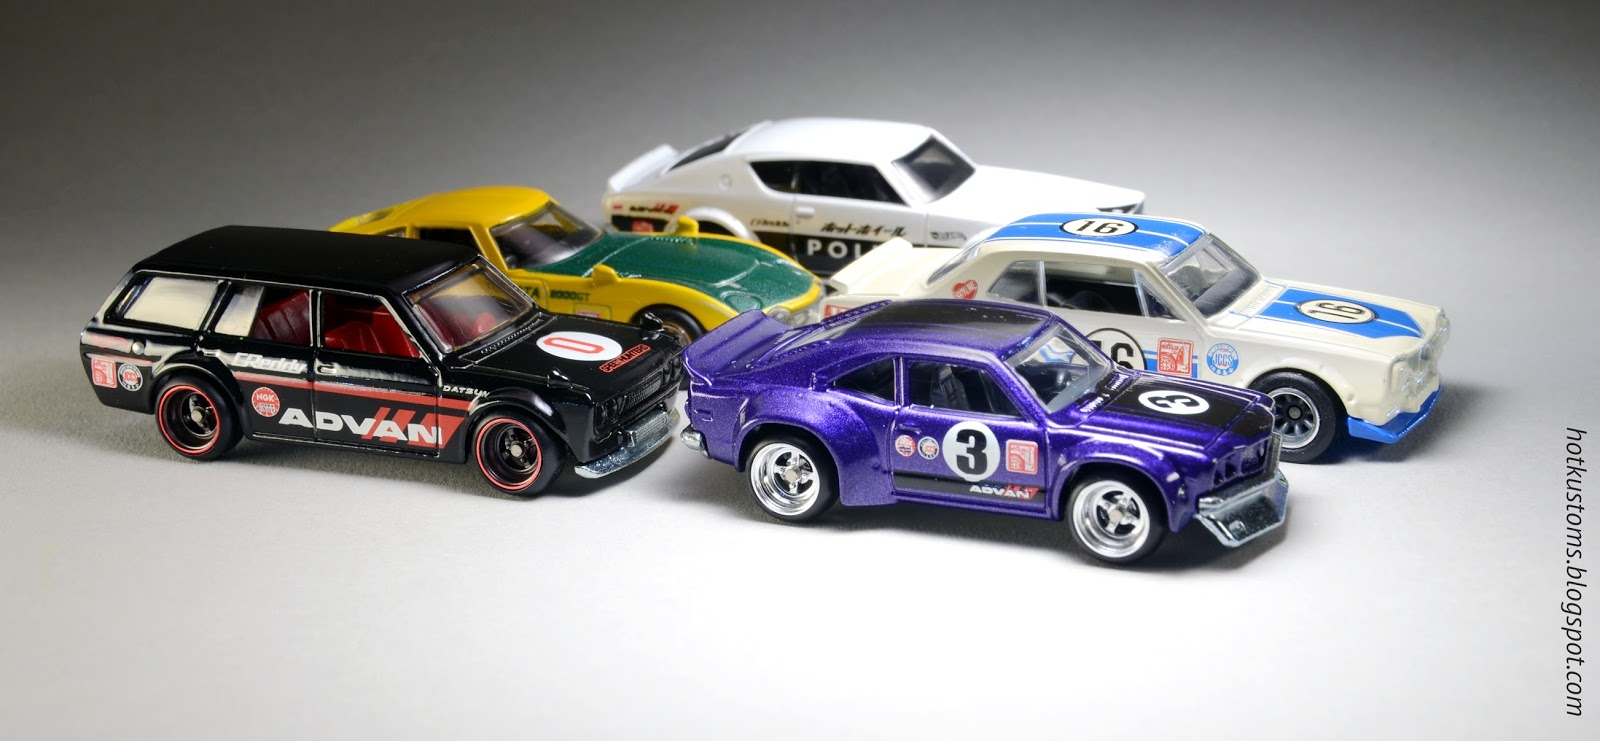 Hot Kustoms Mini Cars: What is peg warmers? 2016 Japan ...